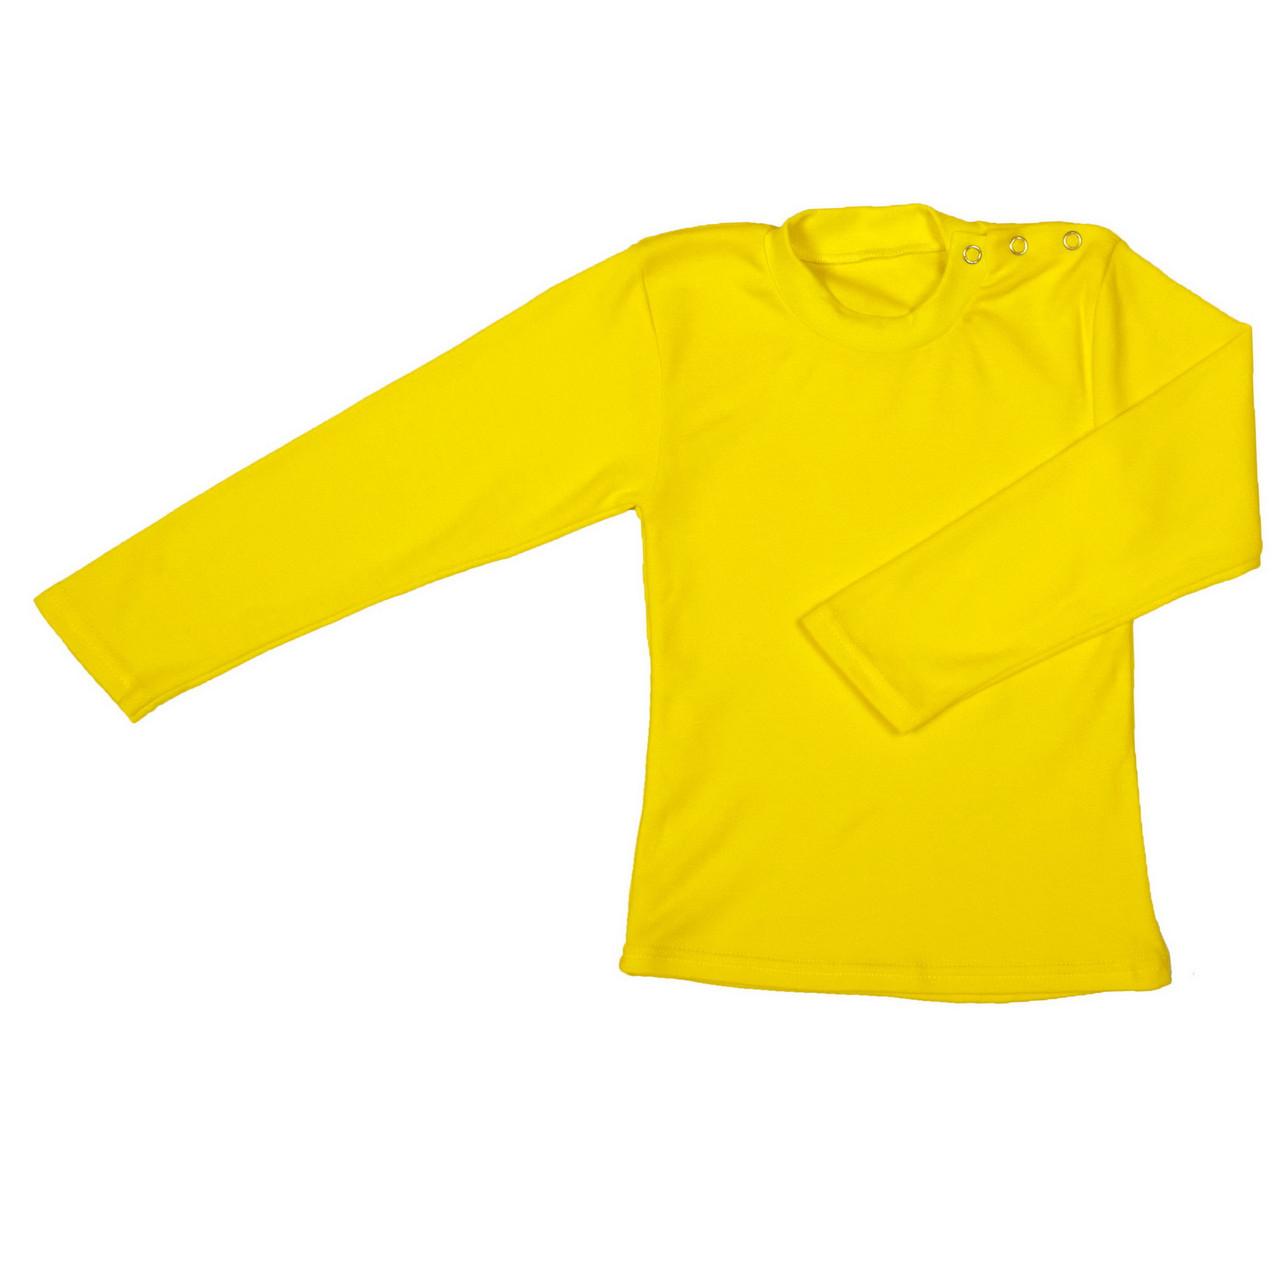 Футболка кнопка длинный рукав, реглан желтый